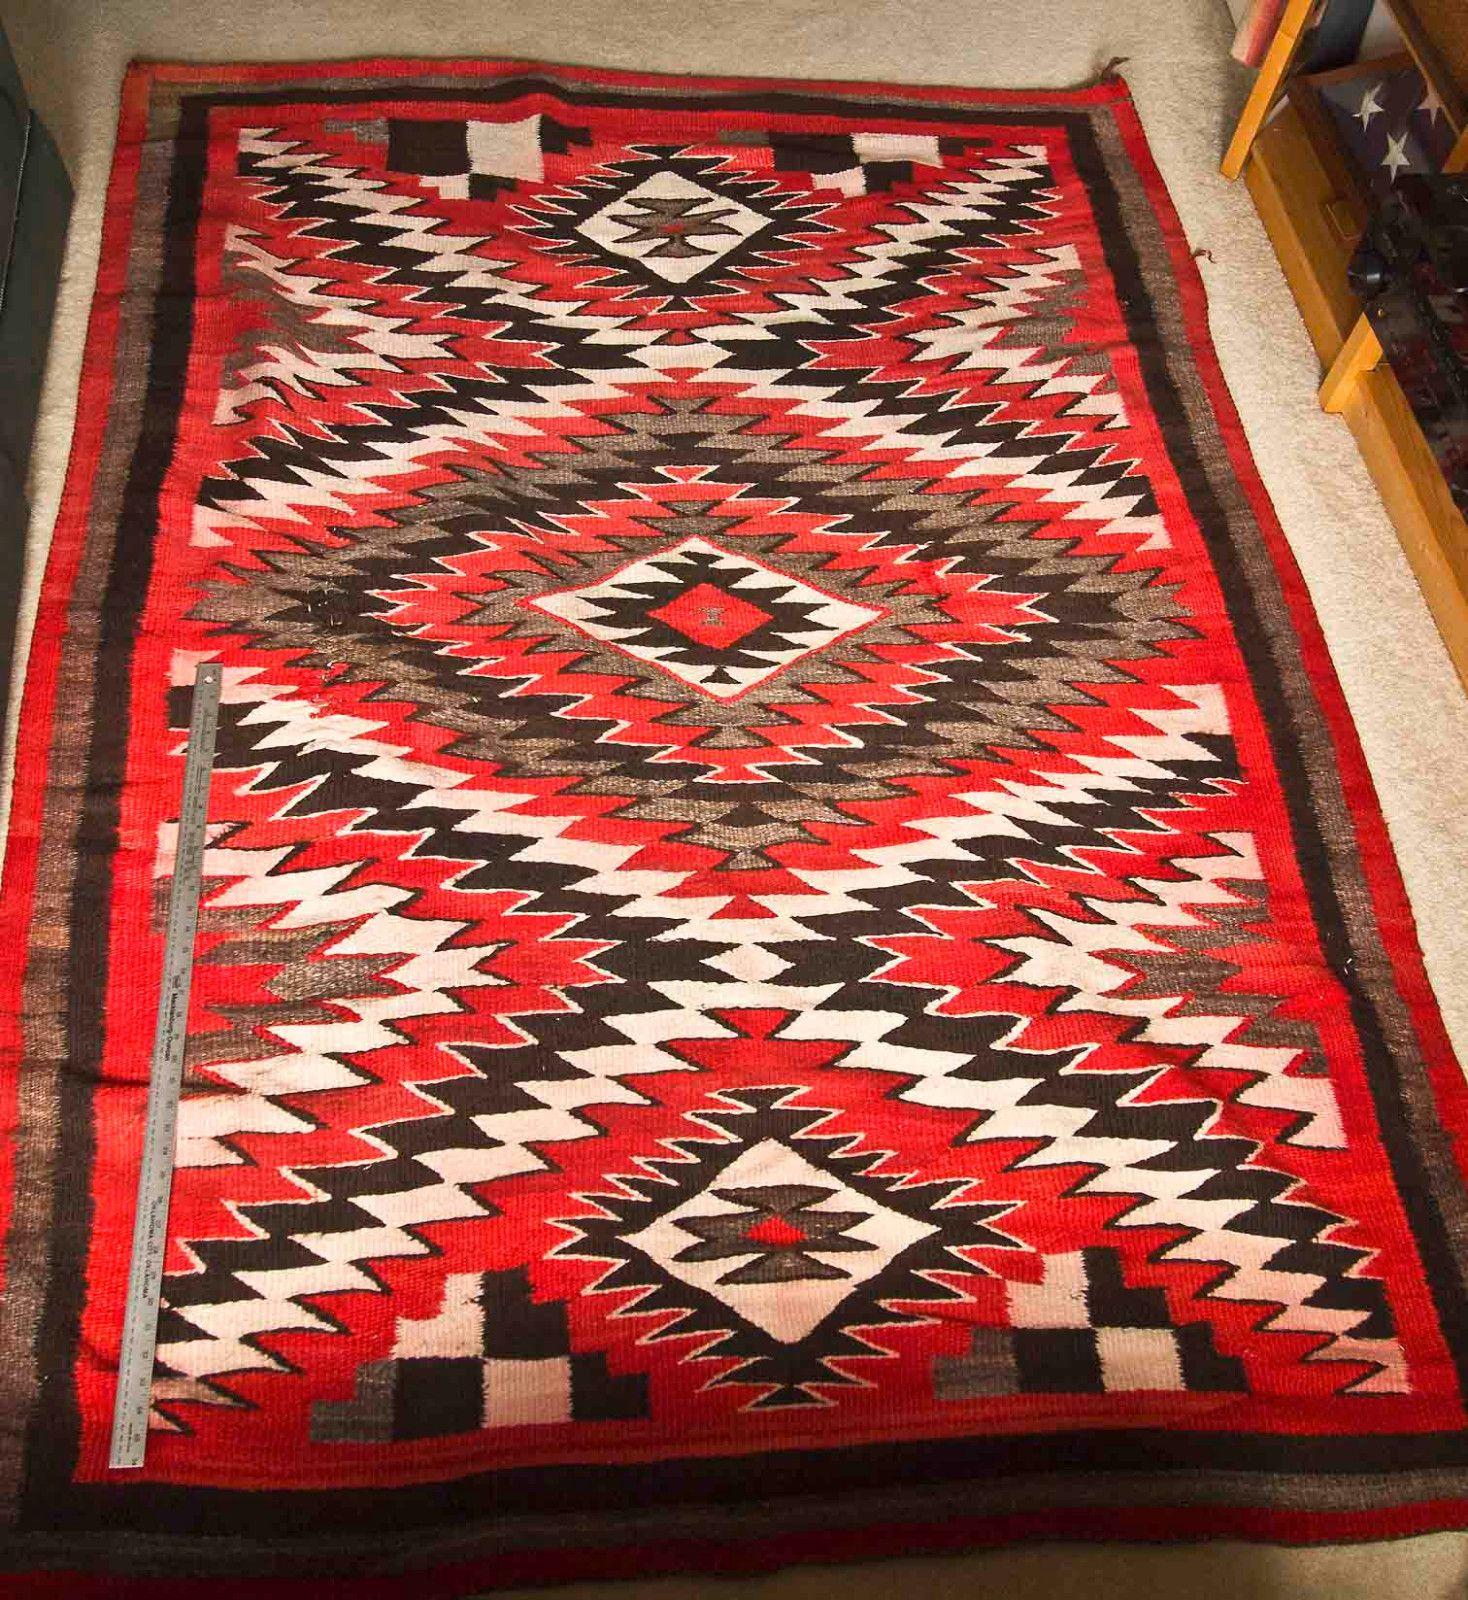 Vintage Large Navajo Rug Transitional Period 1868 1890 Ebay